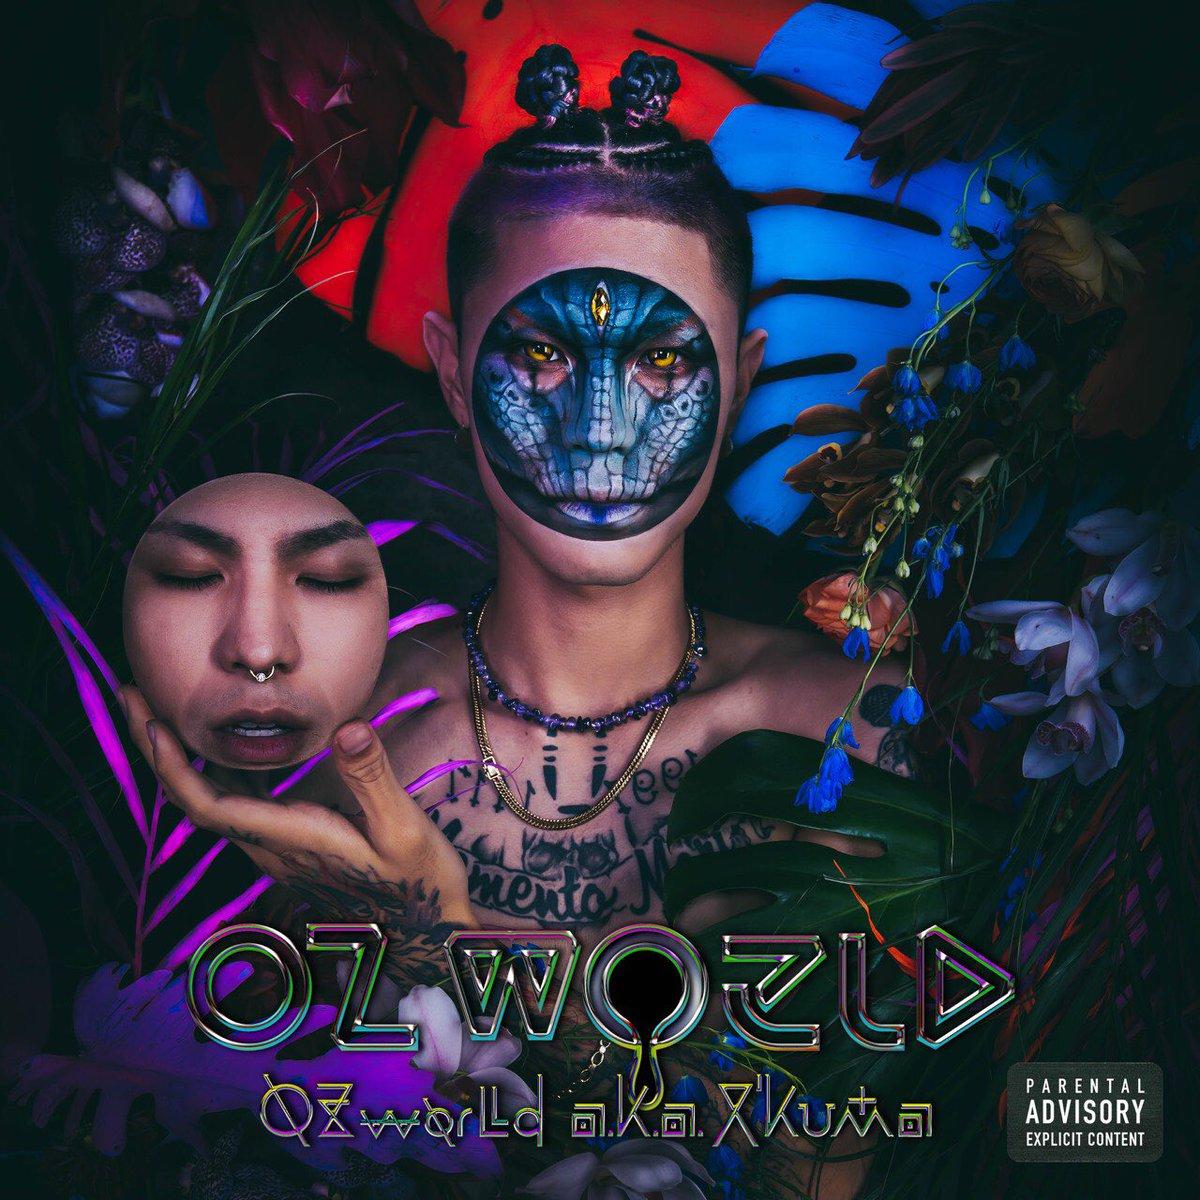 [JP🇯🇵]OZworld a.k.a. R'kuma – 'あさがたのミートパスタ教' (Prod. Howlin' Bear)